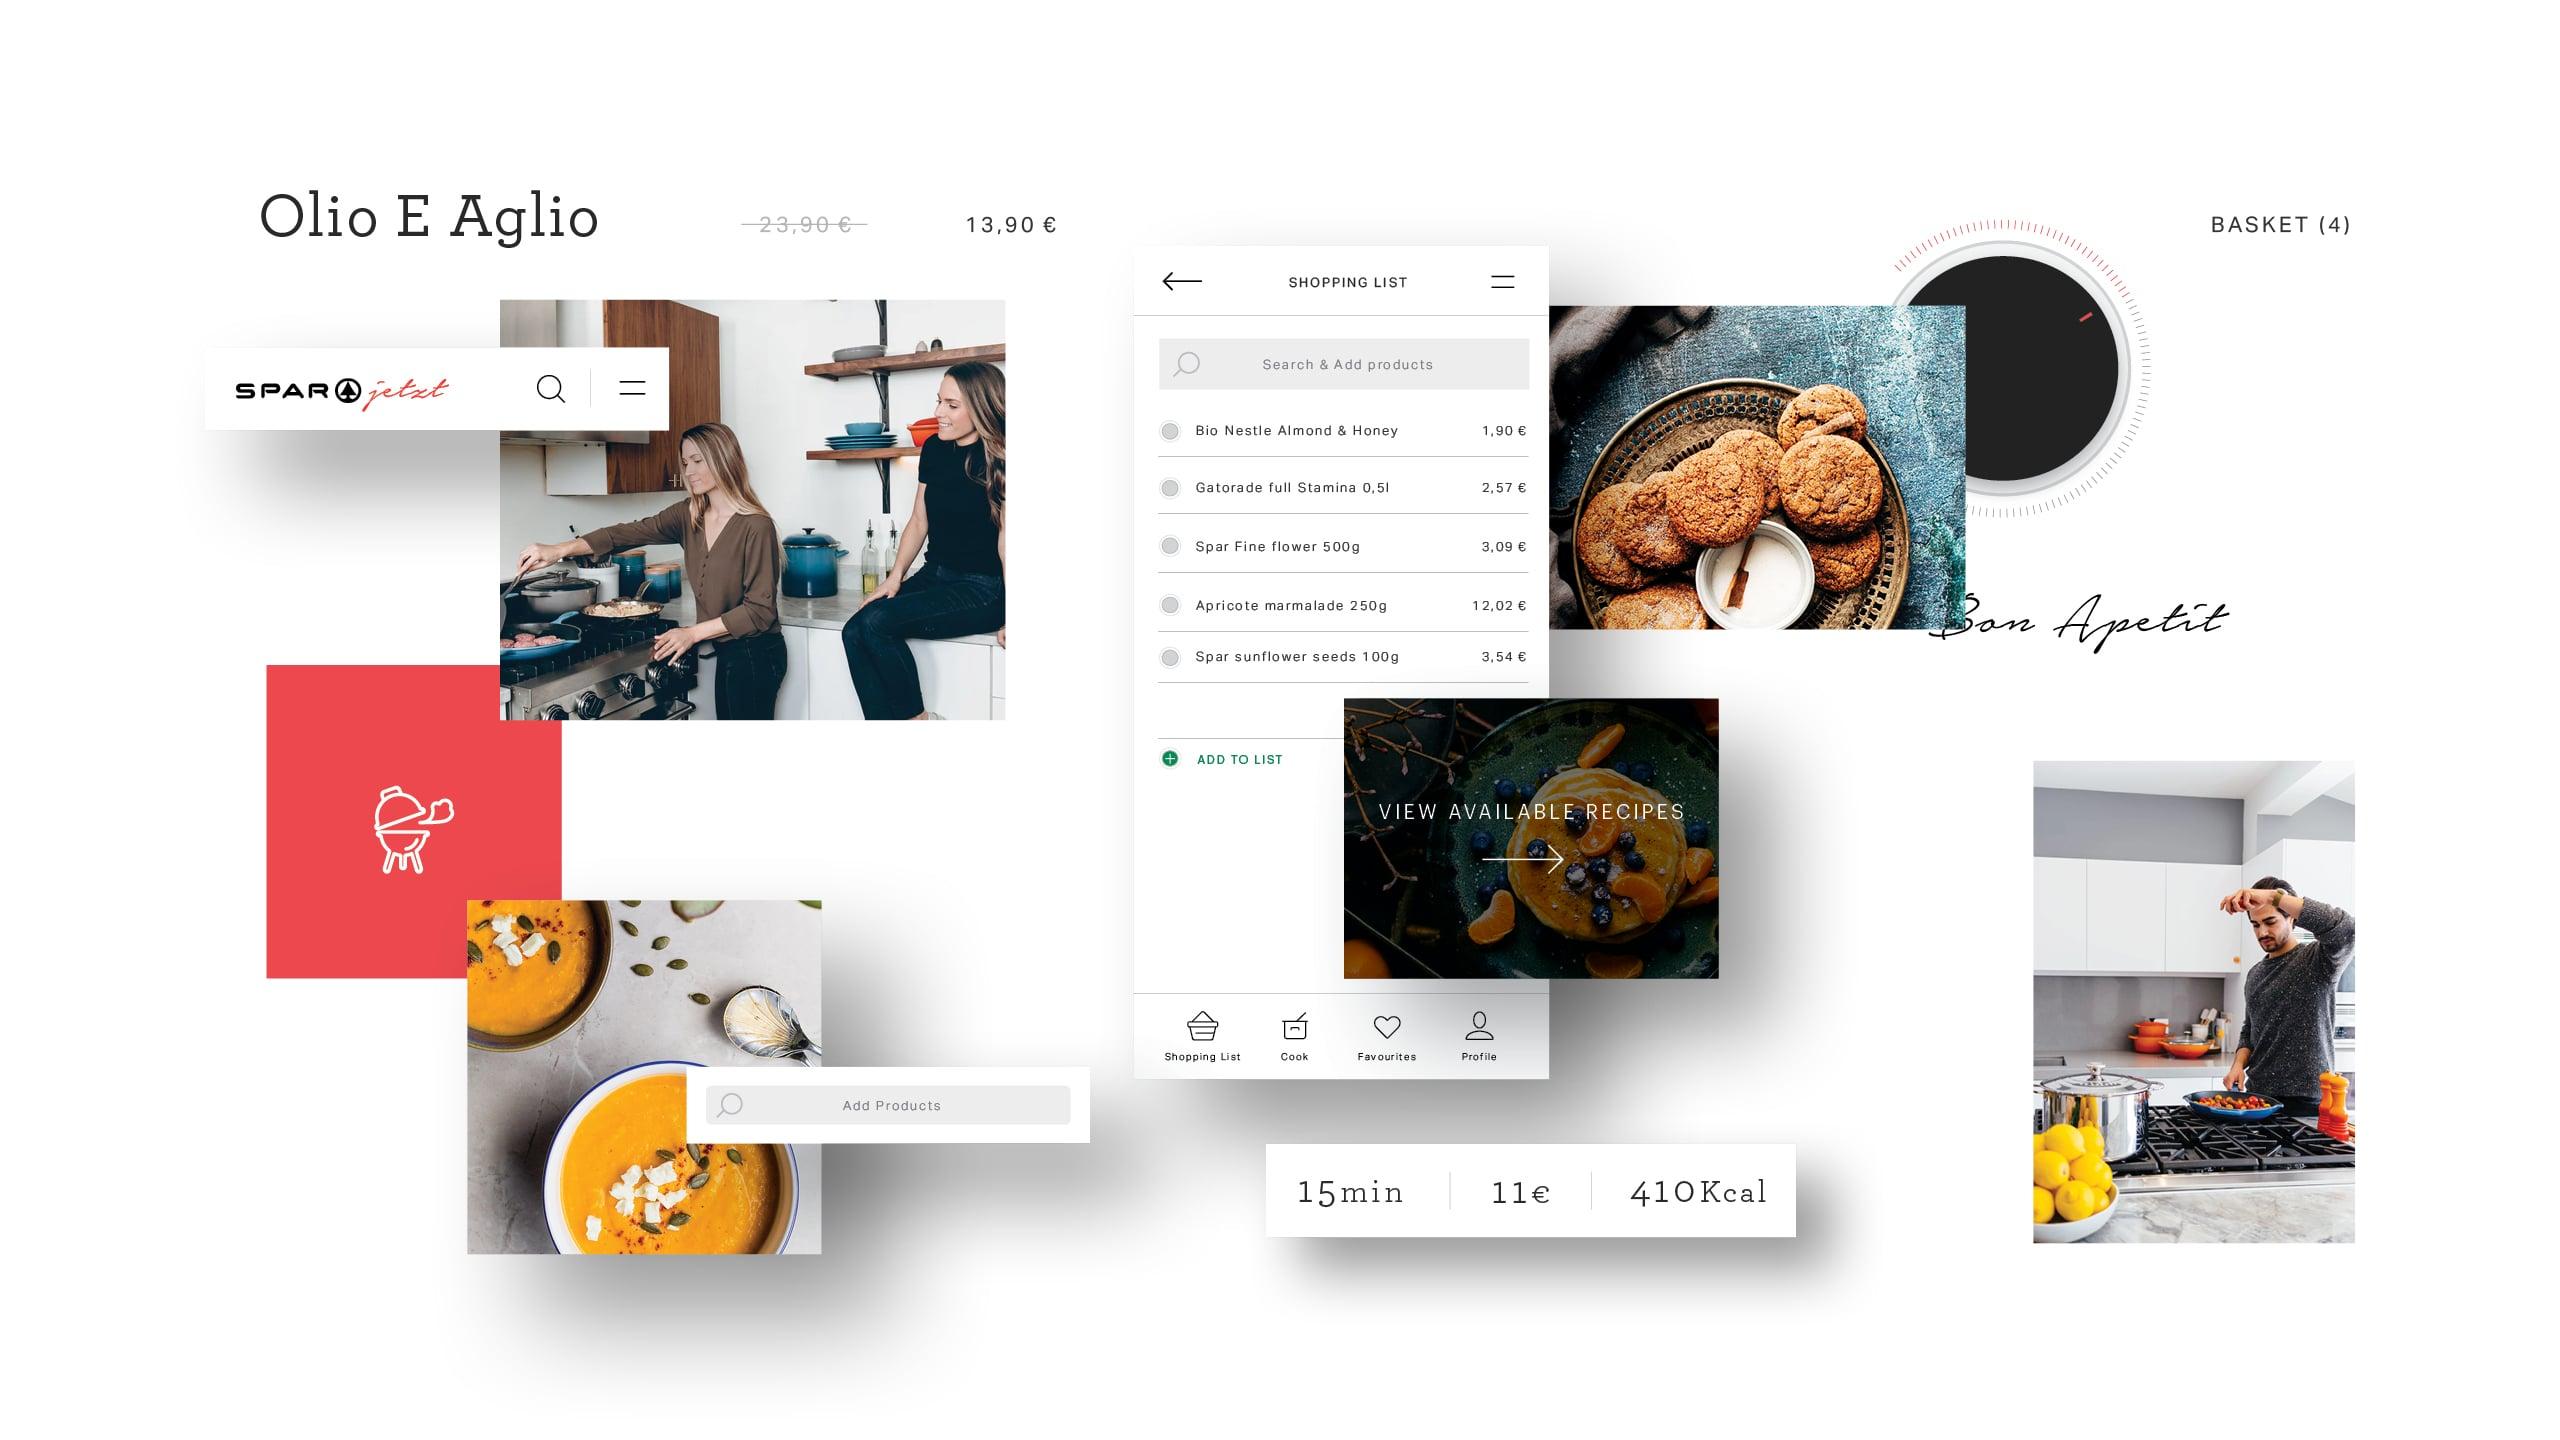 mantik-digital-branding-development-agency-chocolate-packaging-webdesign-design-app-ui-shopping-grocery-store24-min